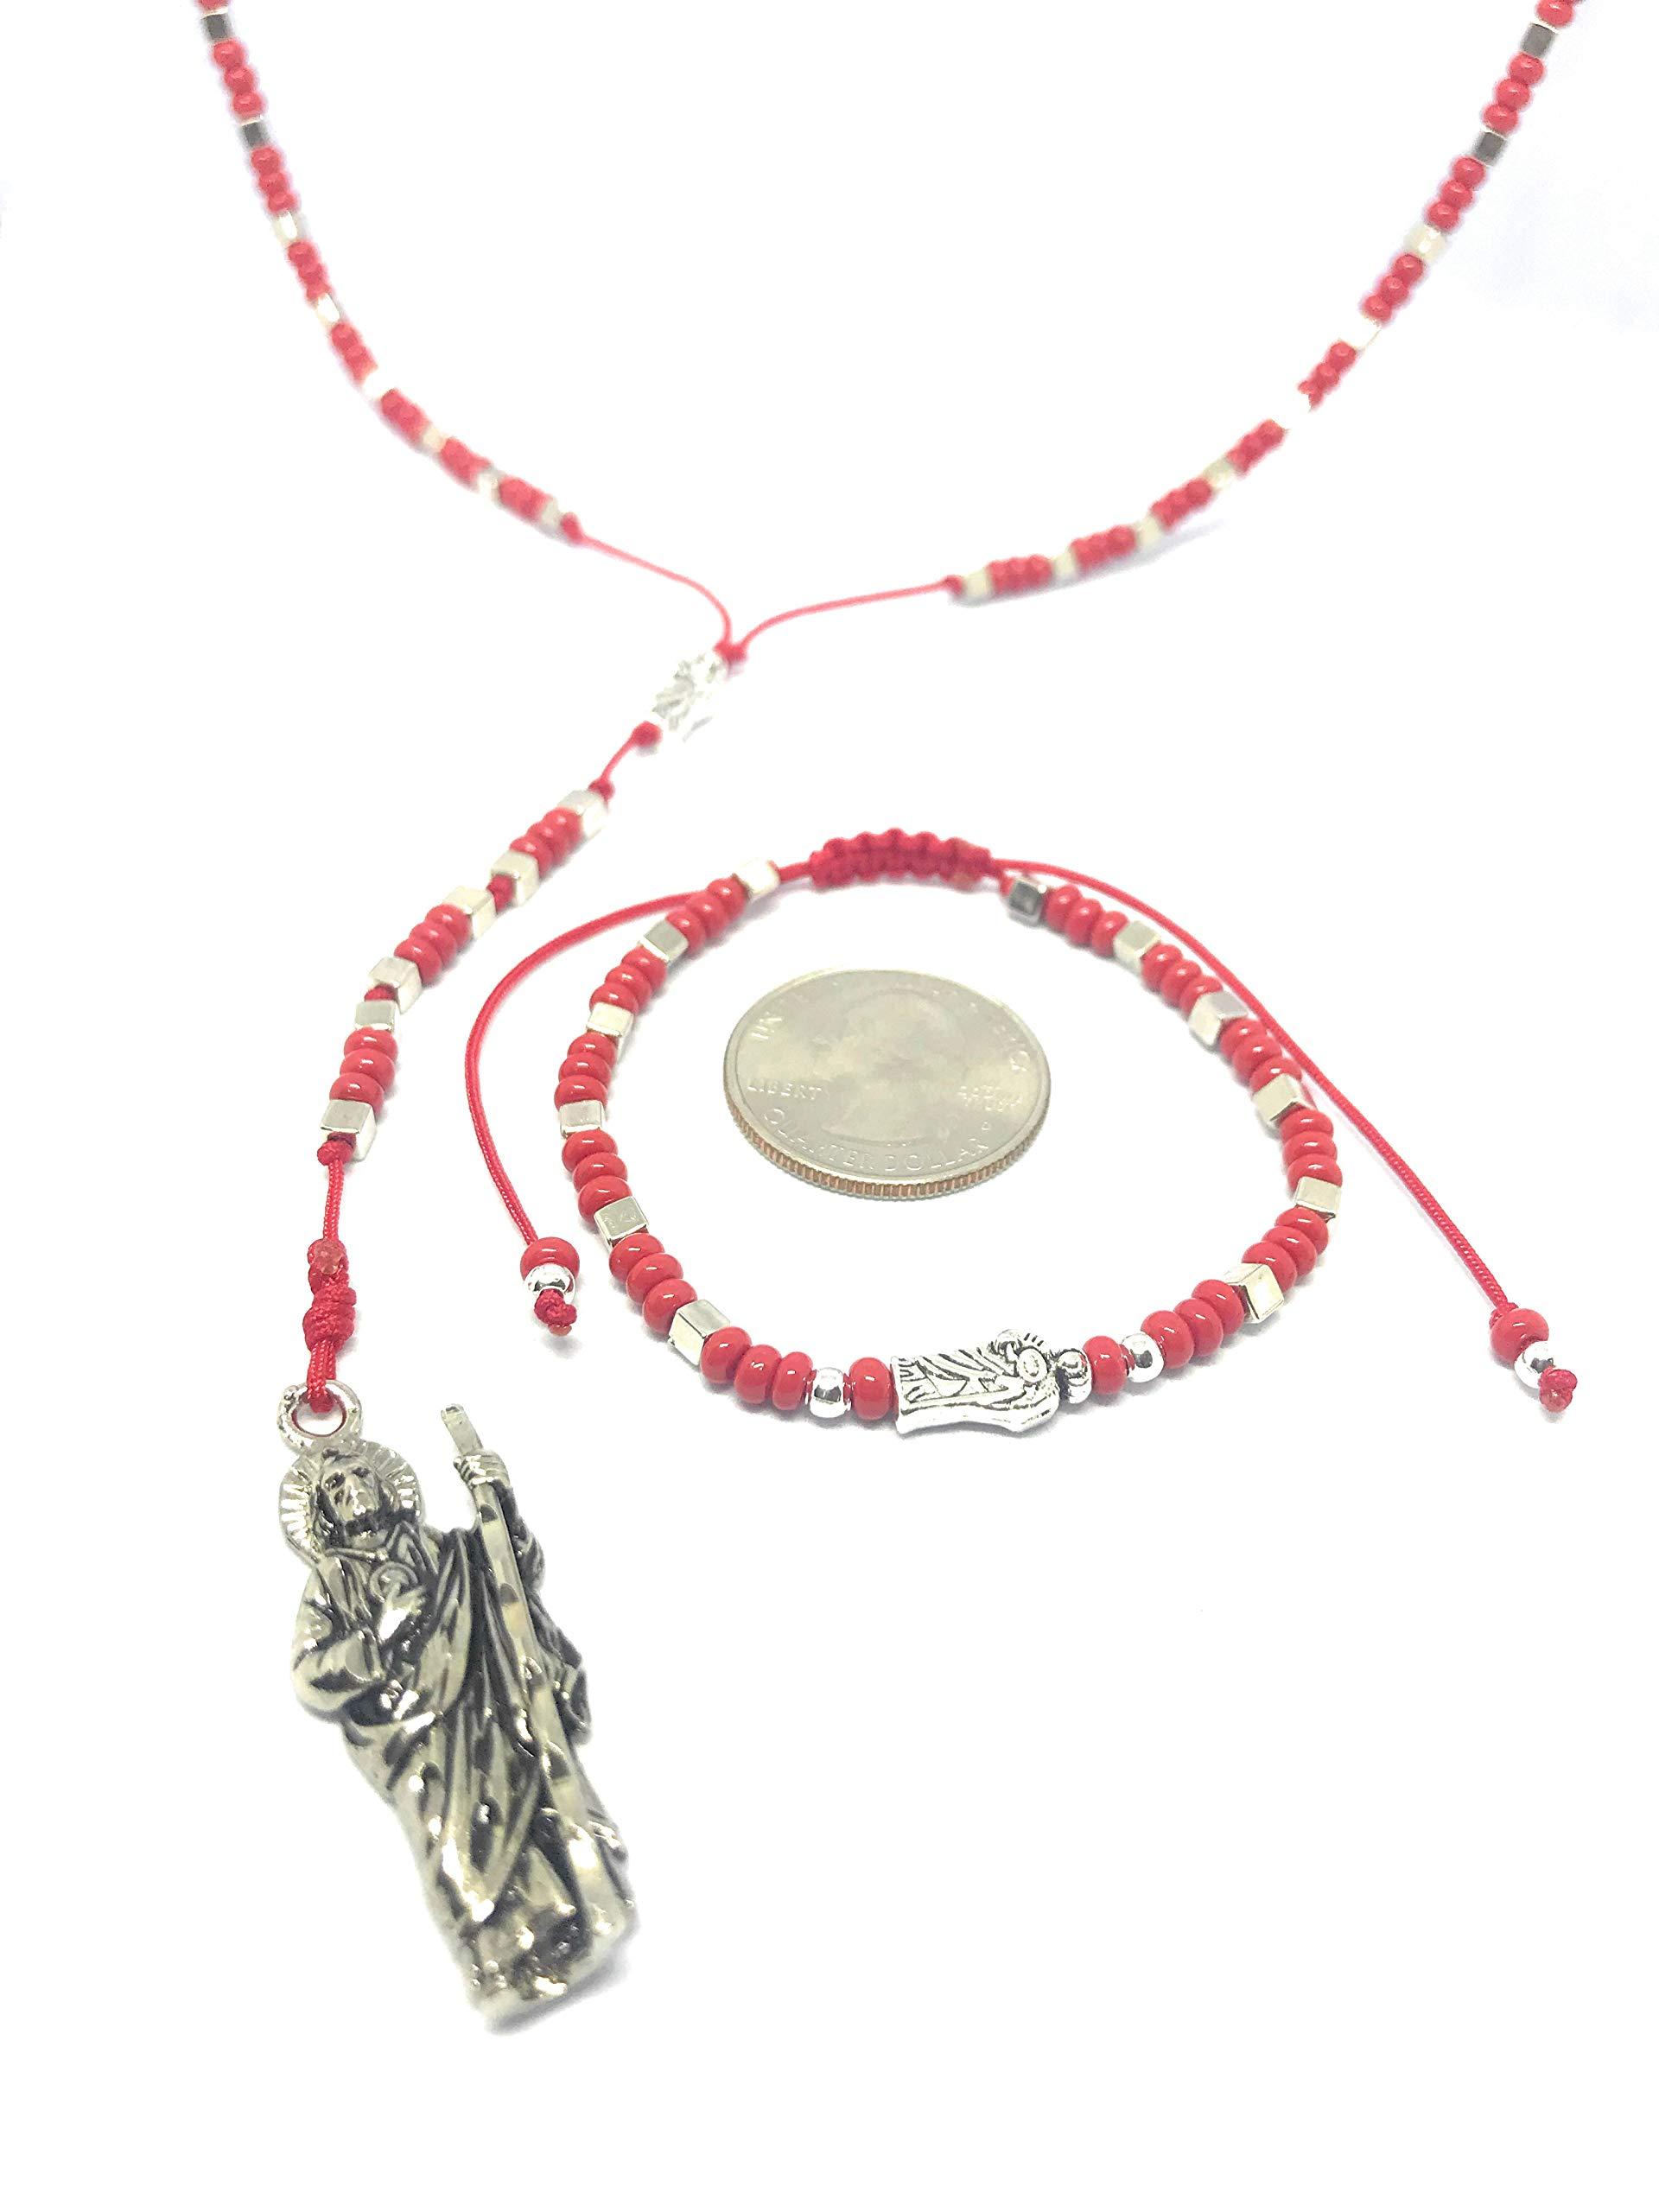 Chavarrieta San Judas Tadeo Rosary and Matching Bracelet.